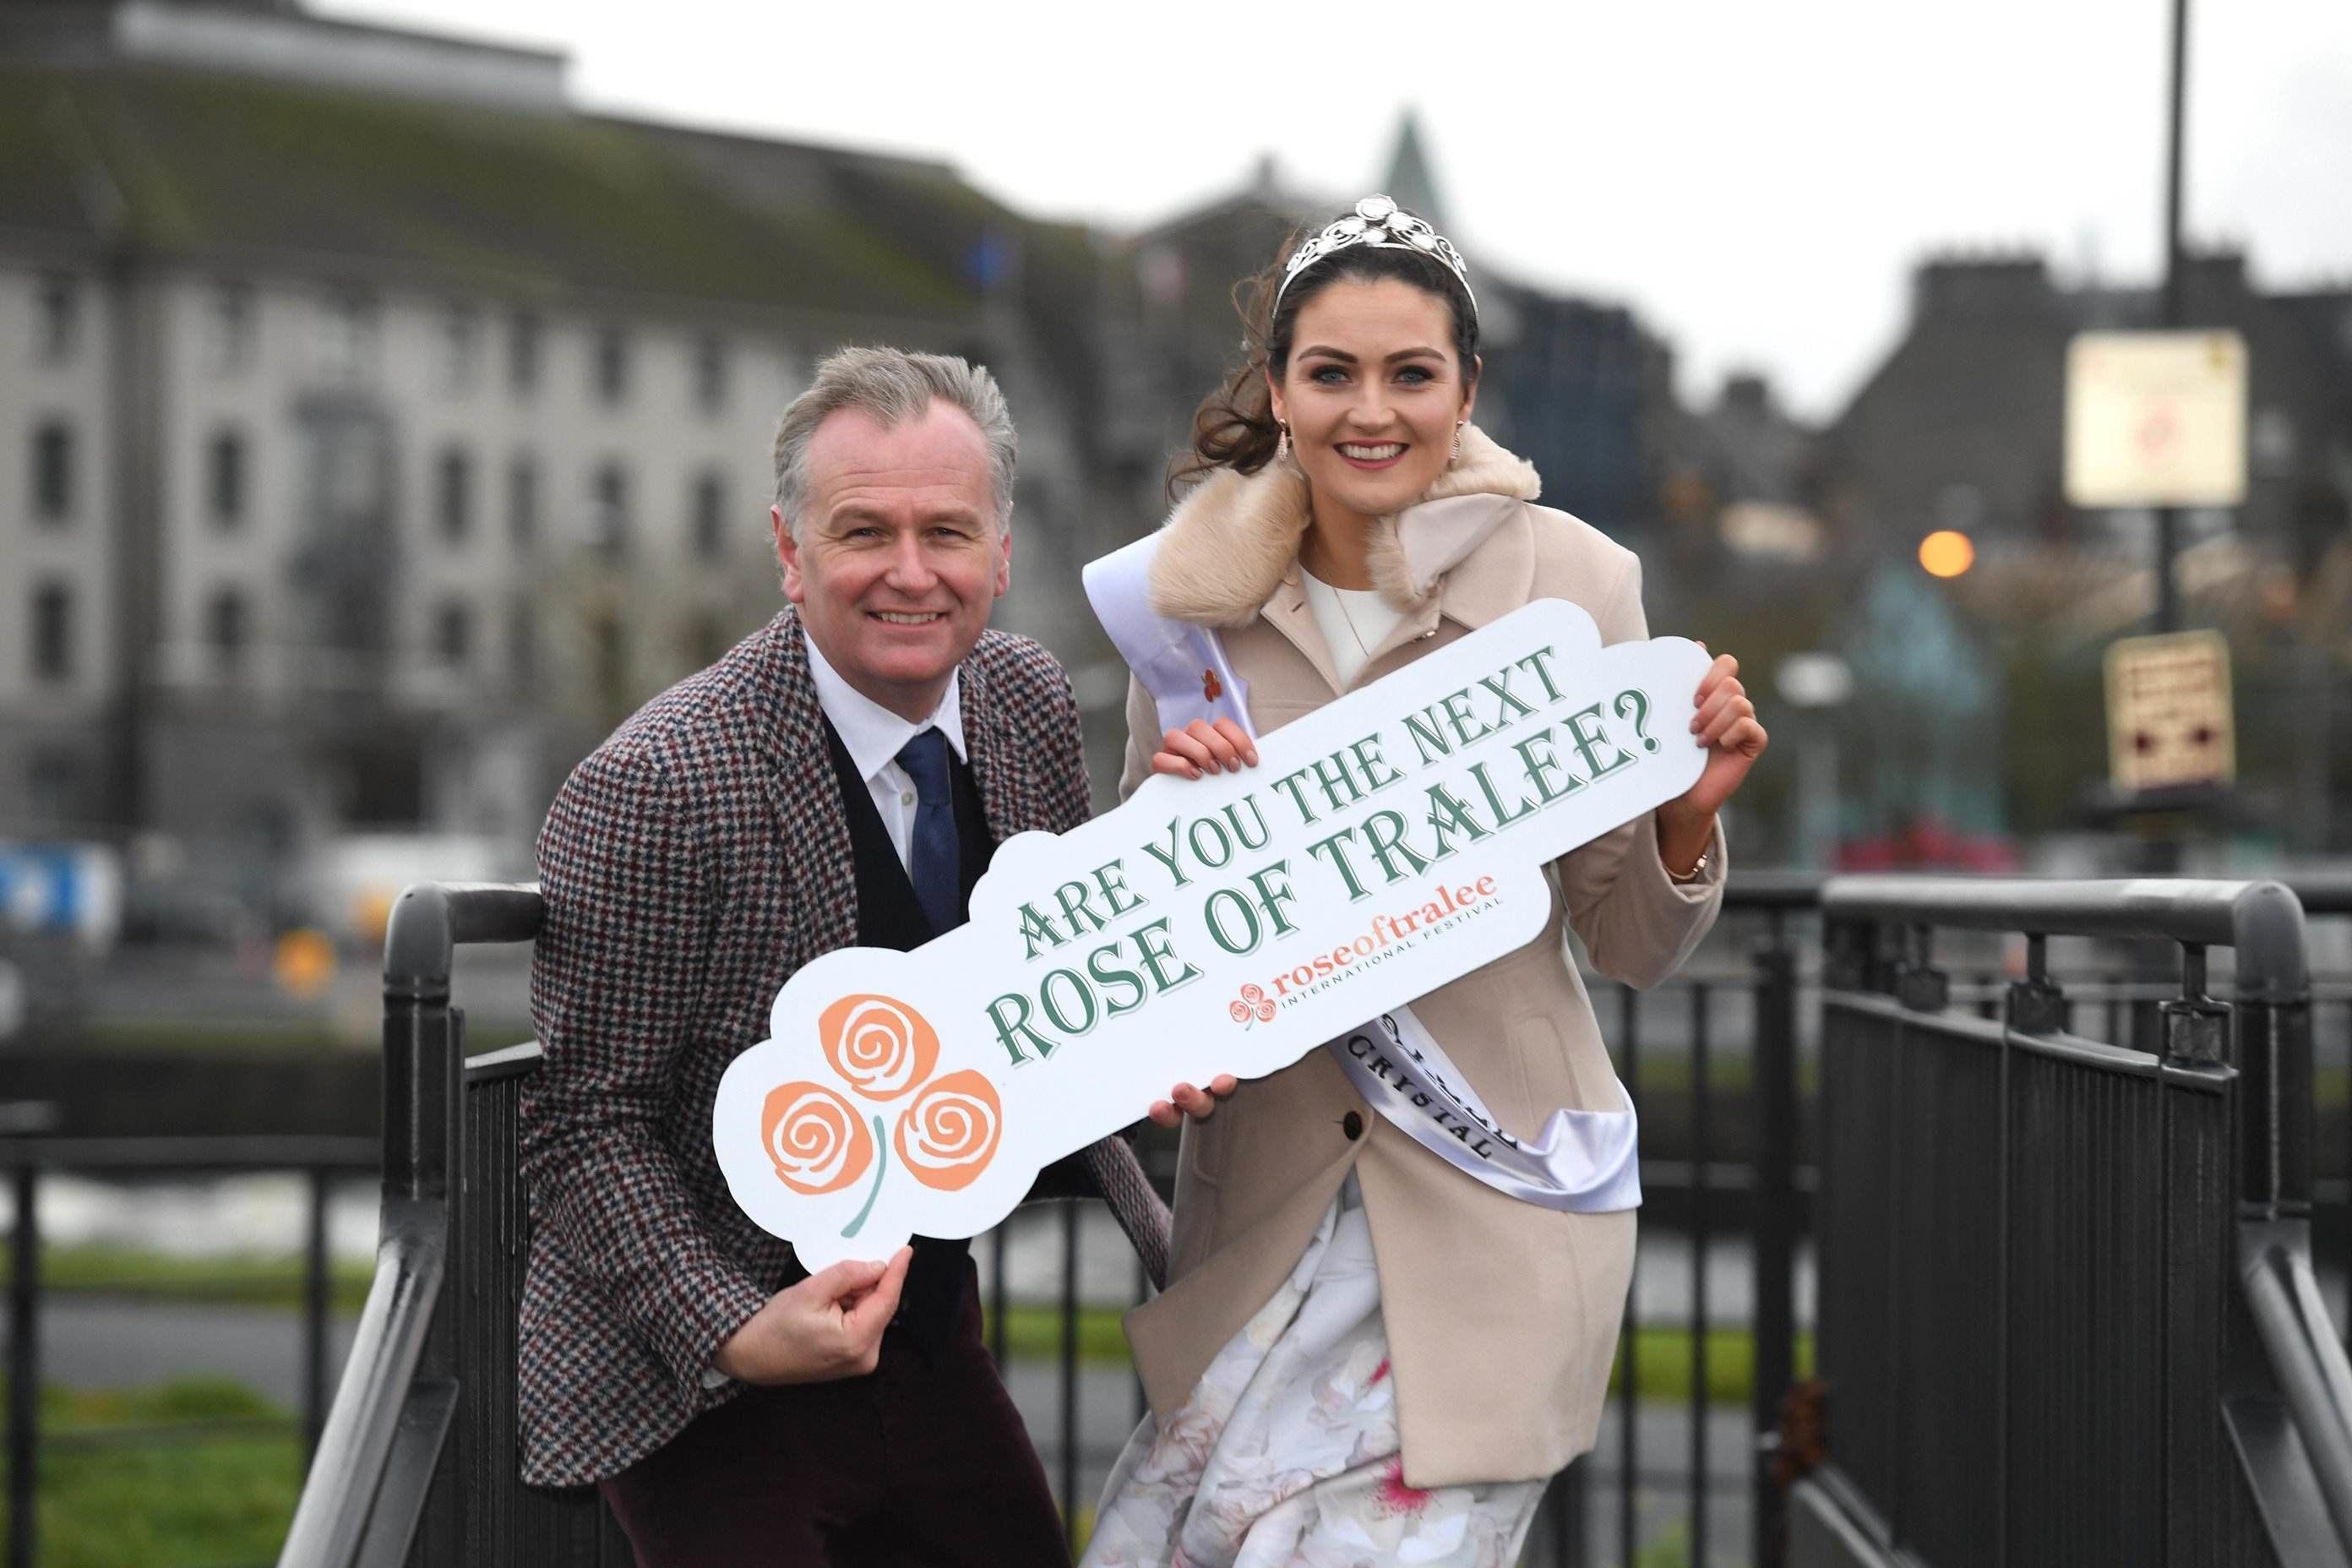 Limerick Rose 2018 search